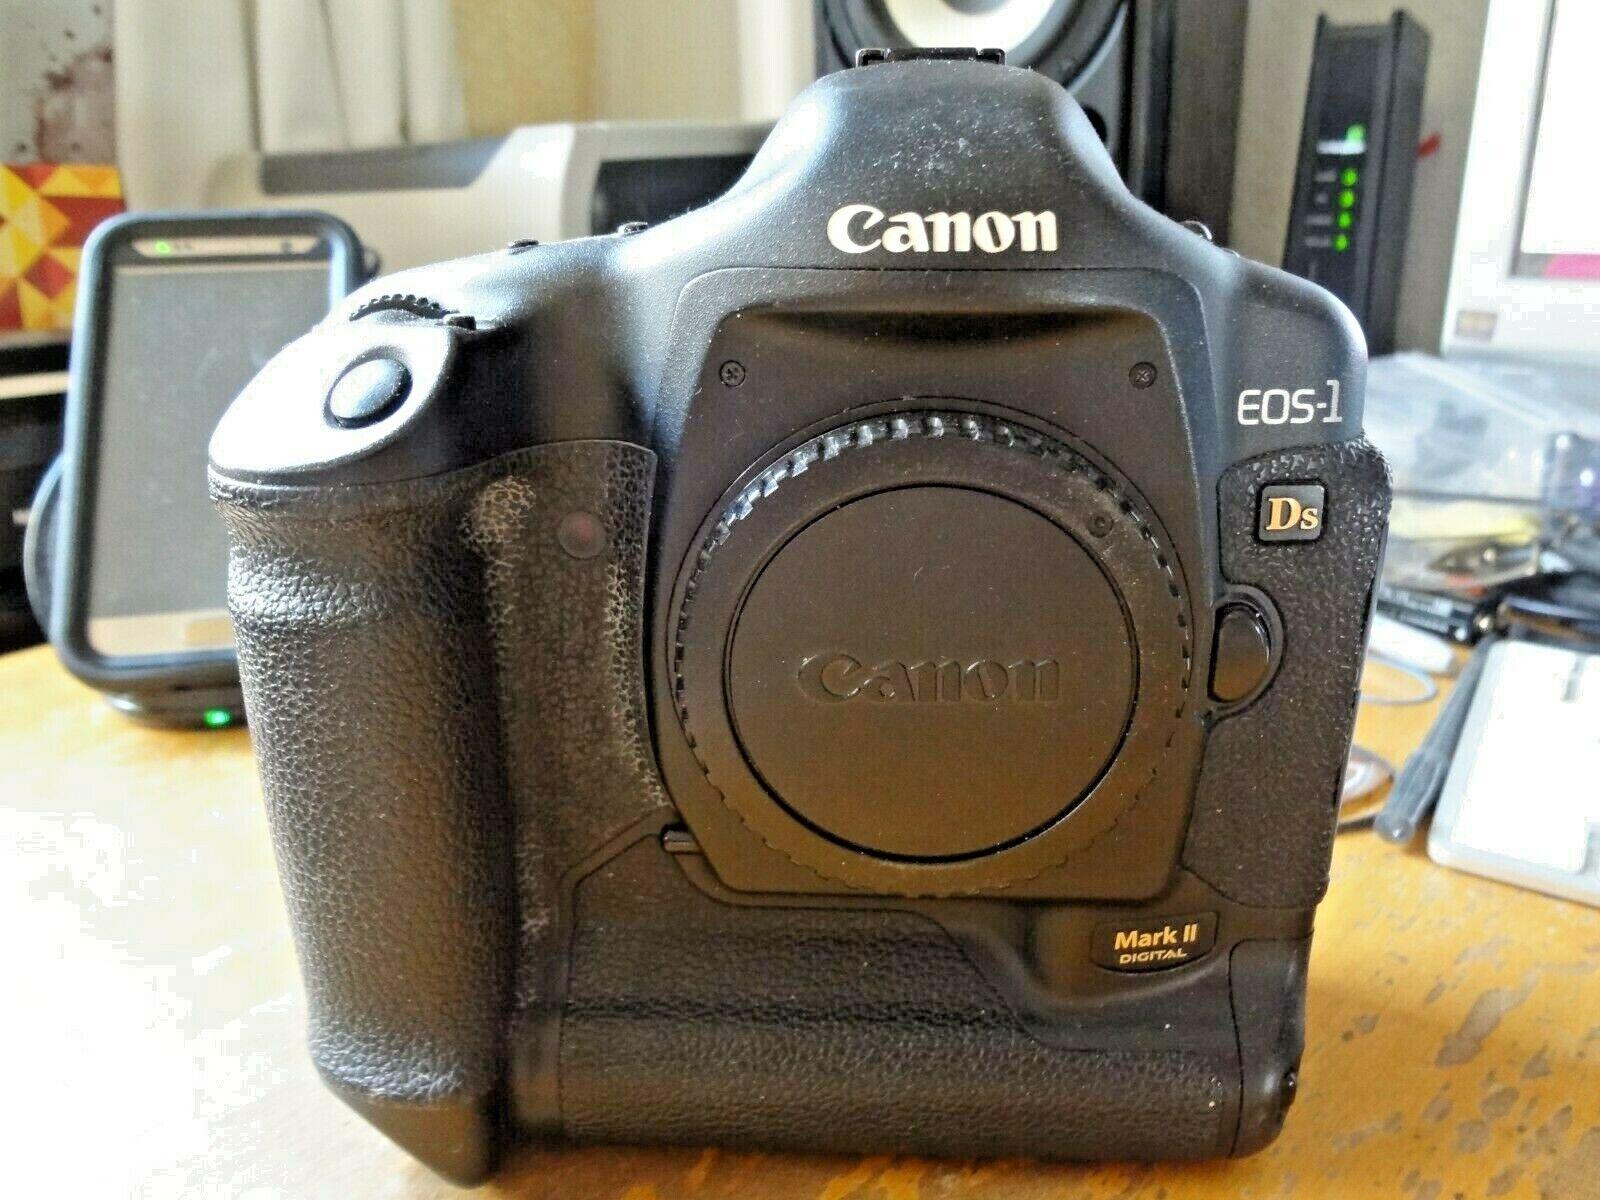 Canon Eos 1ds Mark Ii 9443a002 16 7mp Digital Slr Camera Black For Sale Online Ebay